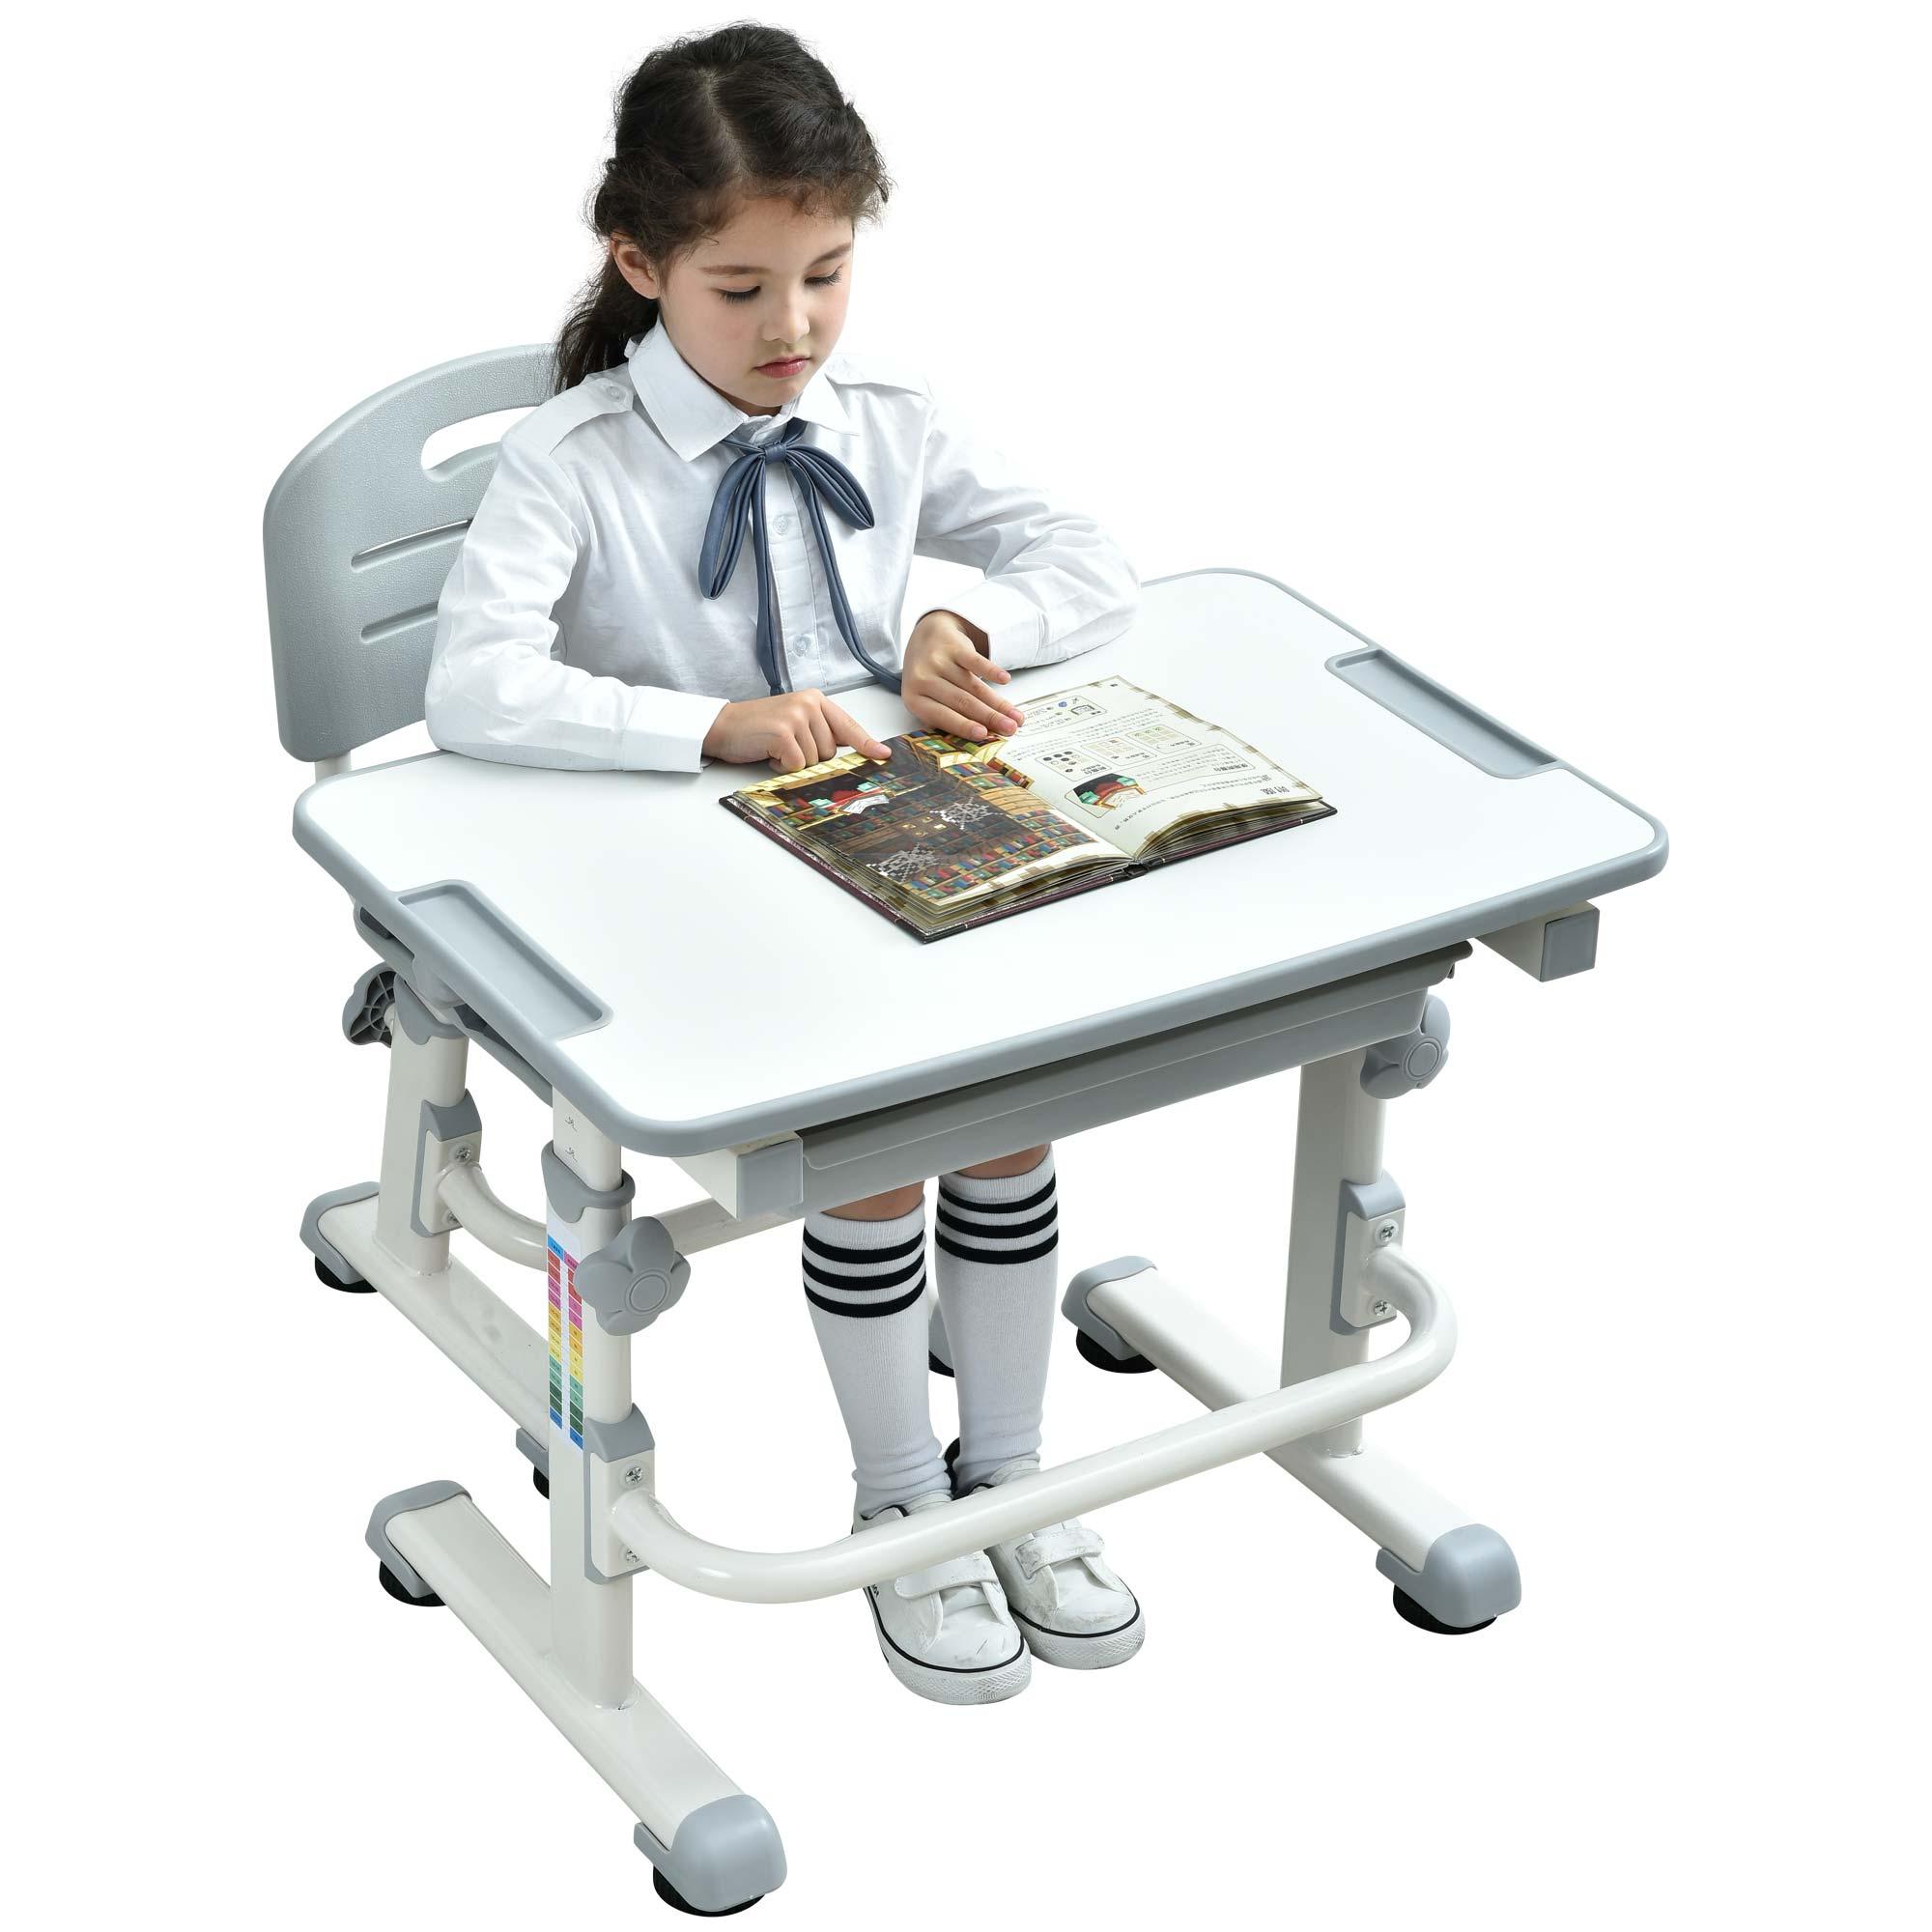 ergonomic-kids-desk-height-adjustable-table-for-kids-school-desk-grey-desk-02